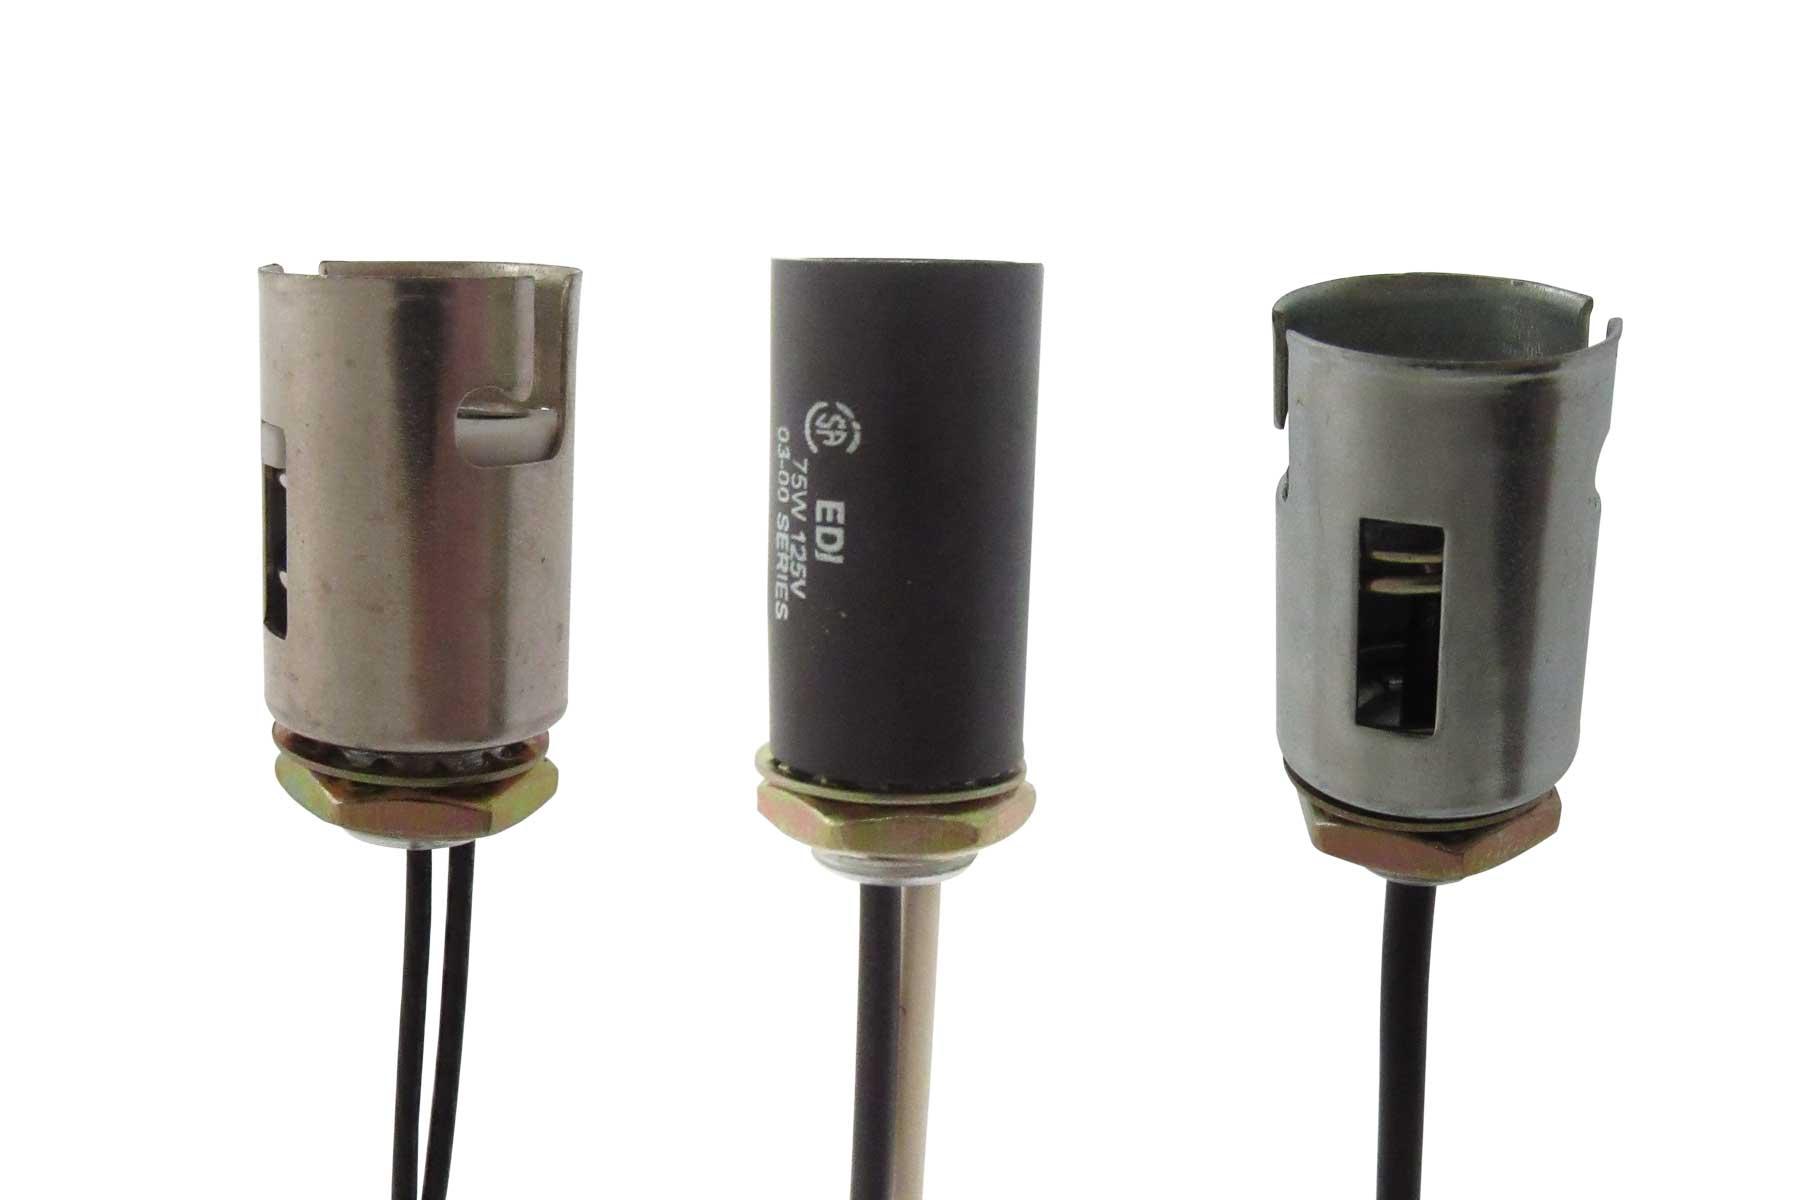 Miniature Bayonet Base threaded bushing socket